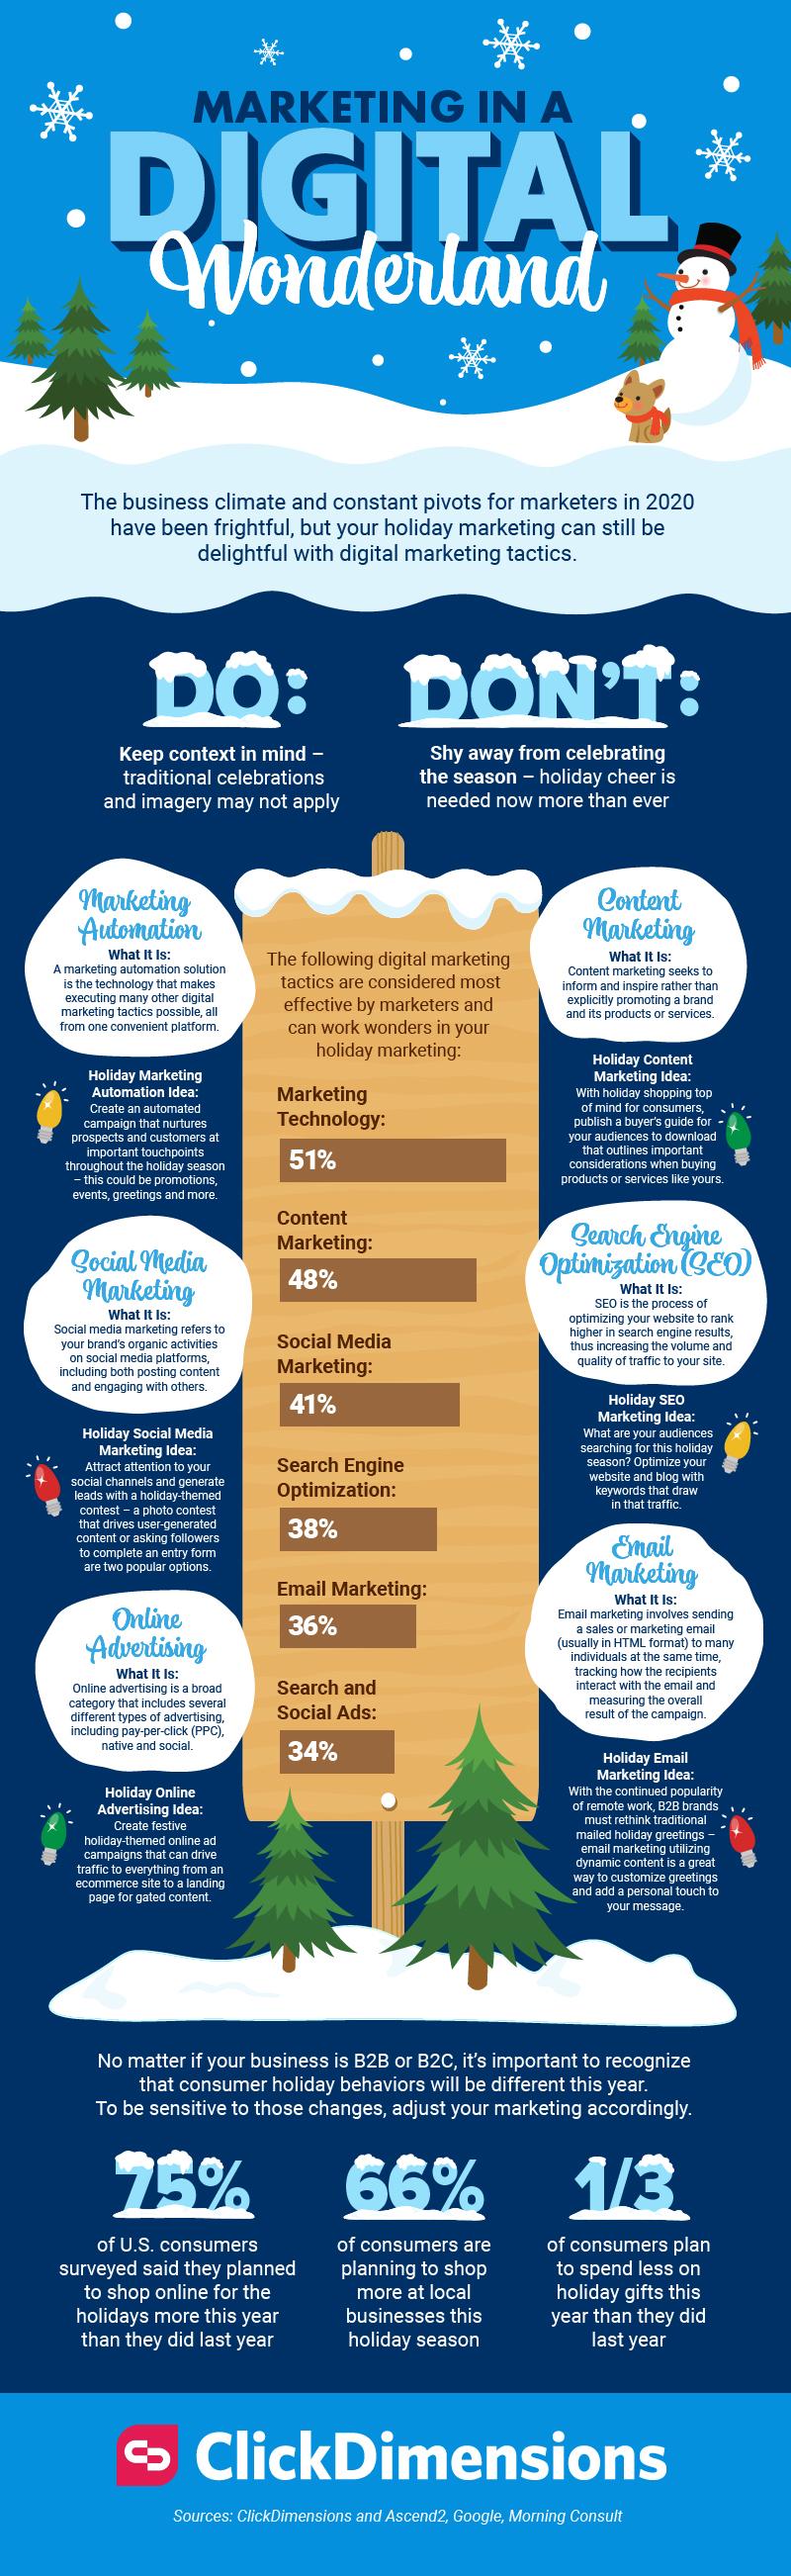 Marketing in a Digital Wonderland #infographic #Marketing #Digital Marketing